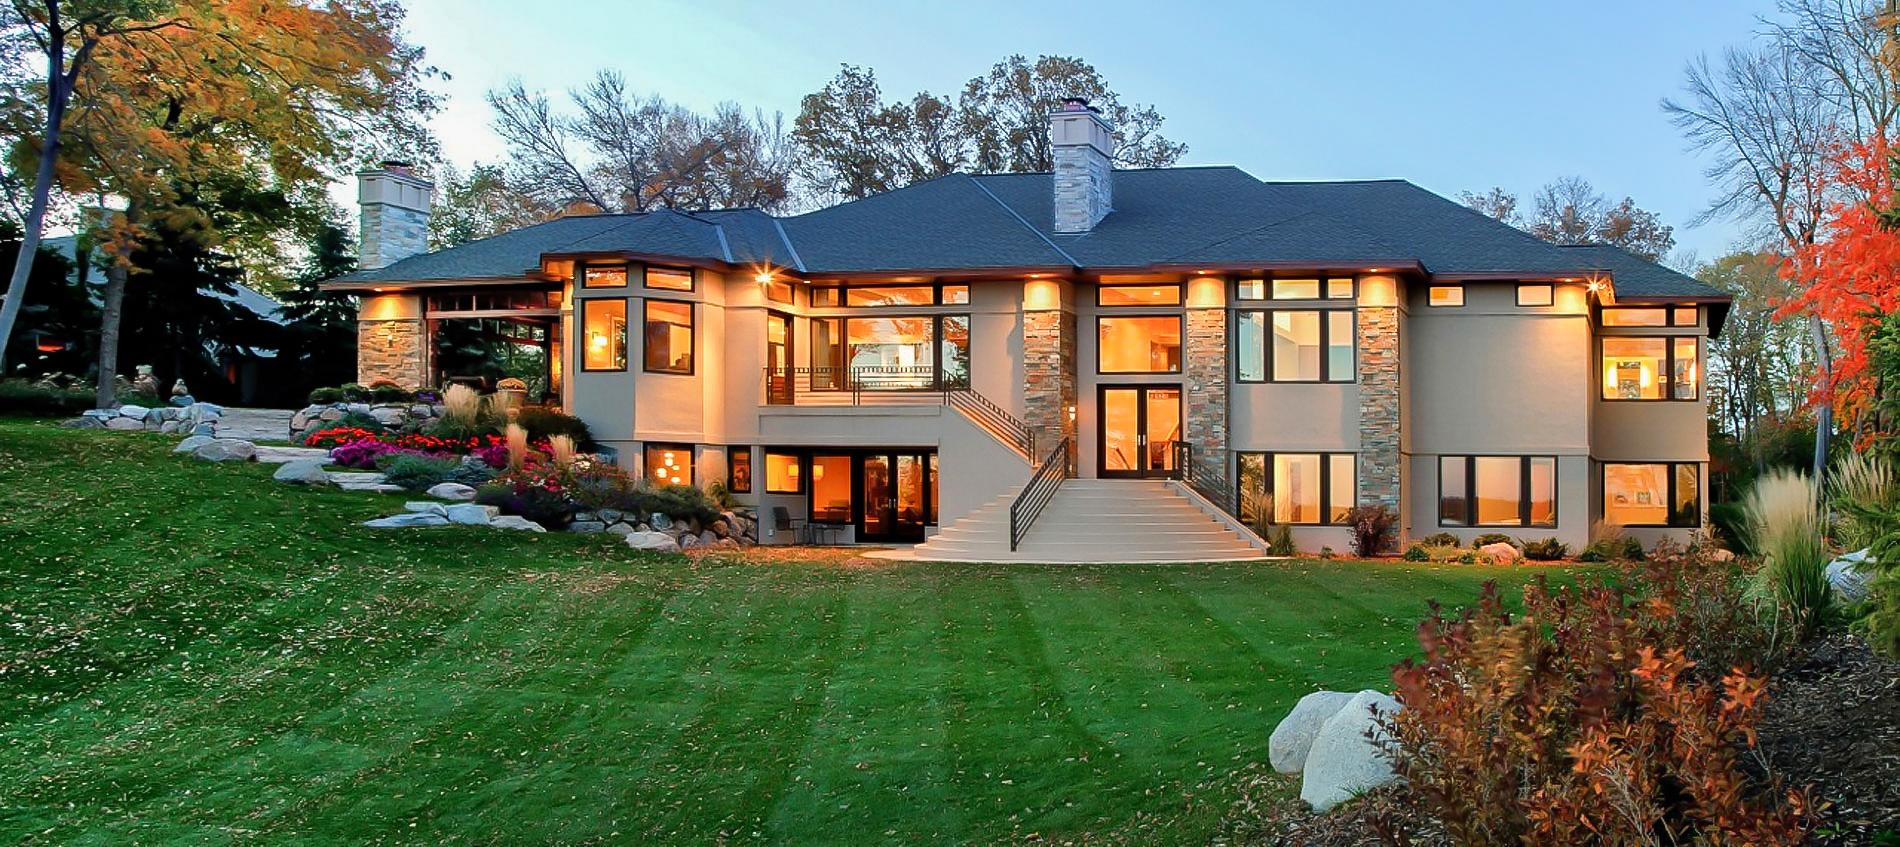 unique luxury home car designs | Smuckler Architectural Custom Homes | Premier Luxury Home ...